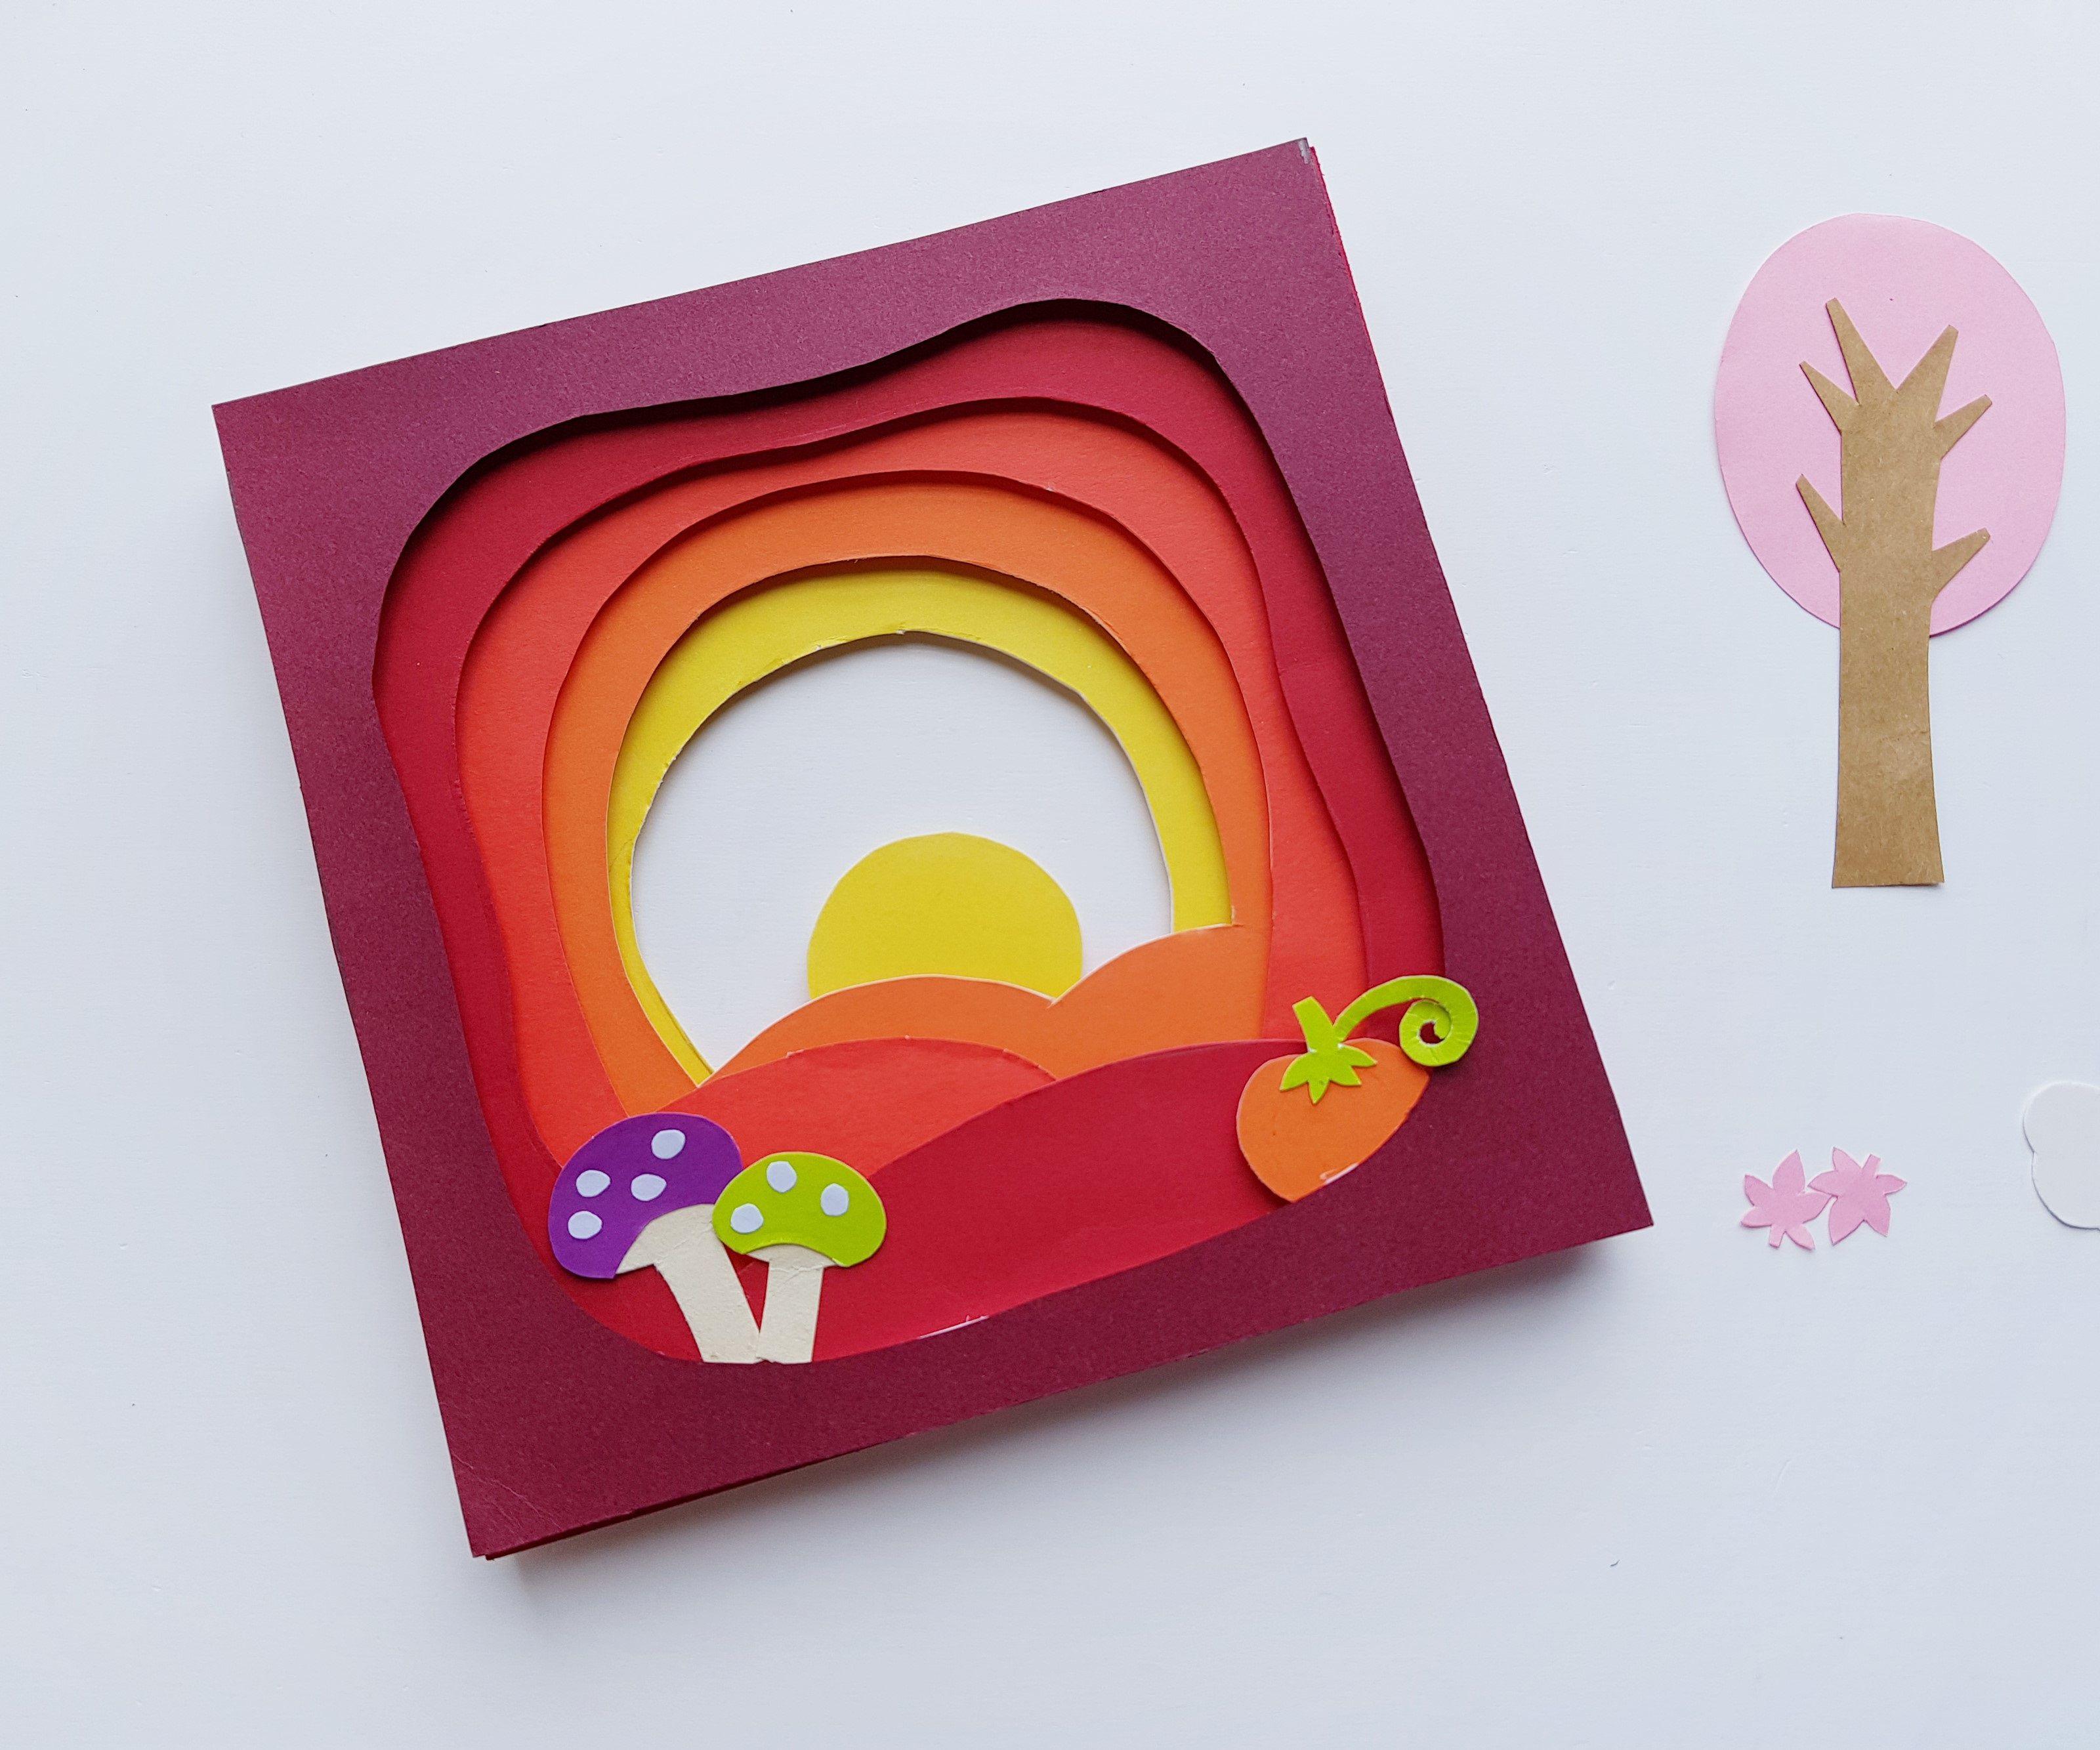 009 Surprising 3d Paper Art Template Inspiration  Templates PdfFull